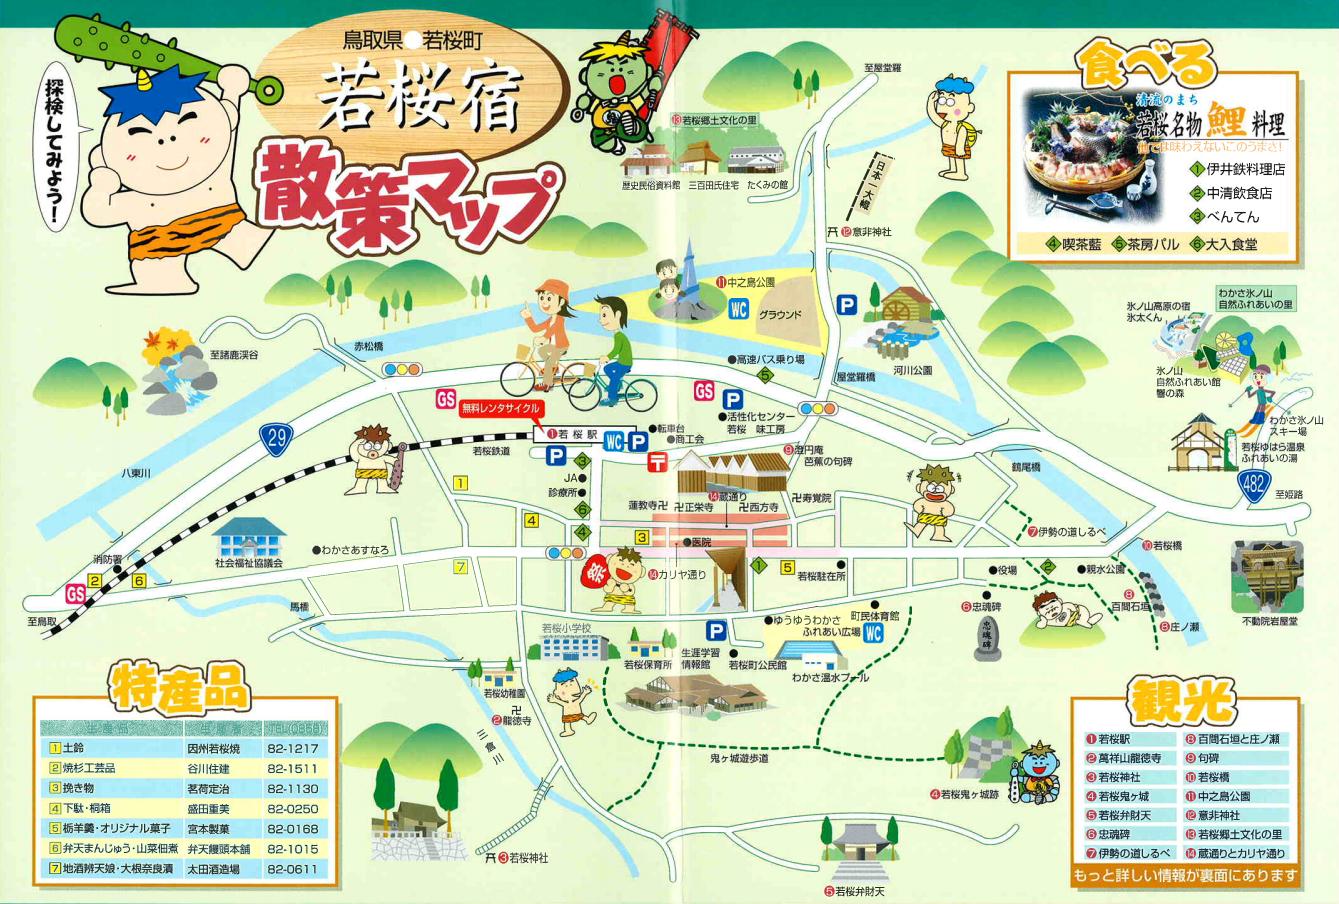 若桜町散策マップ